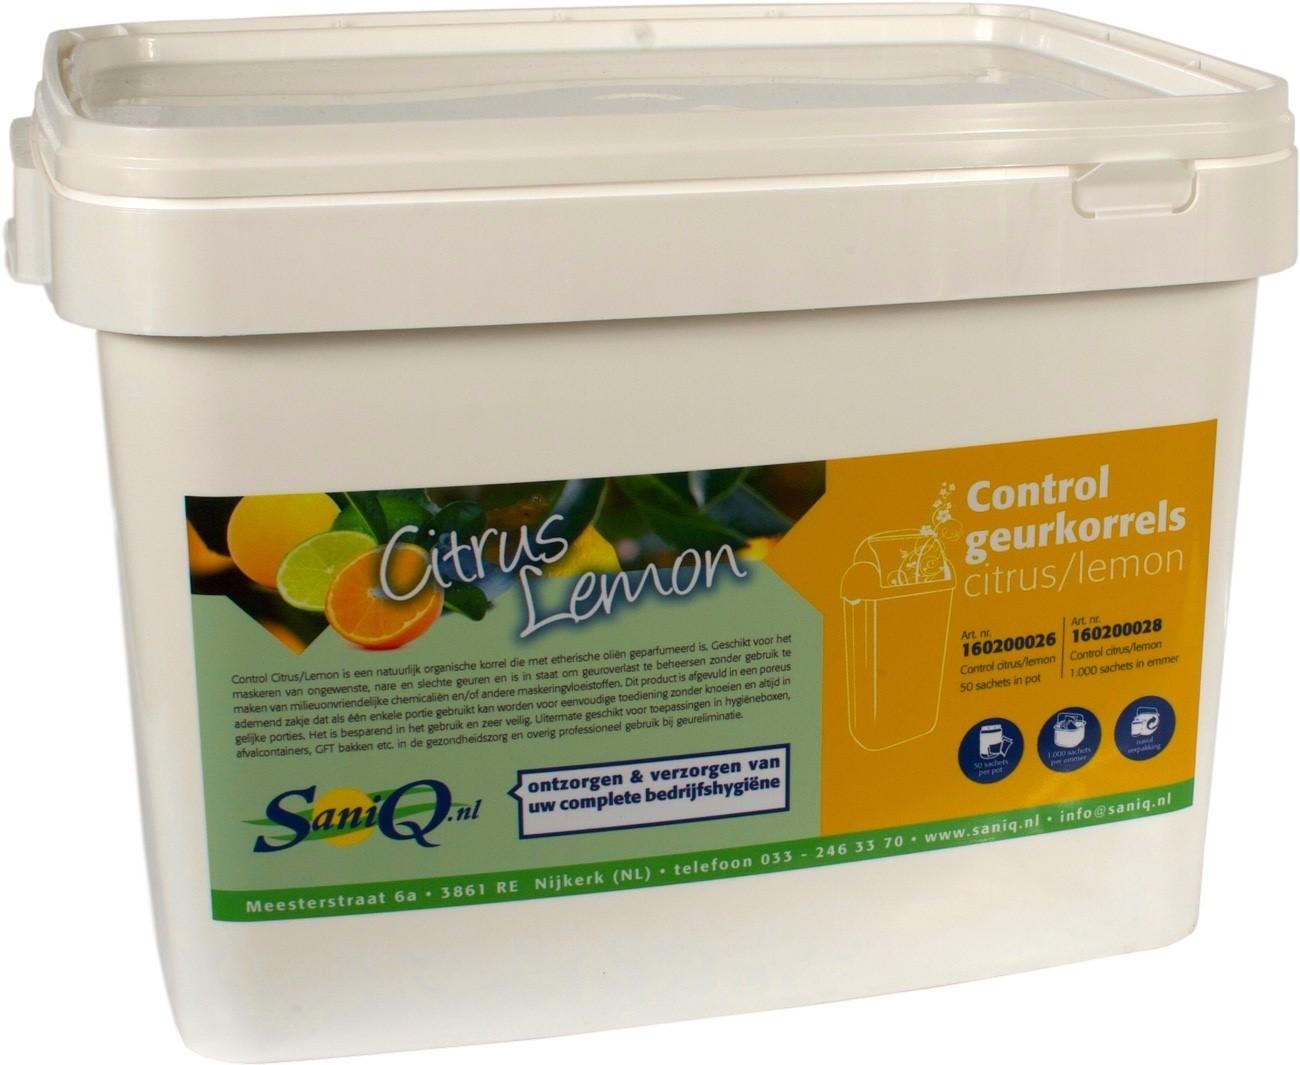 CONTROL sachet geurkorrels Citrus/Lemon, emmer inhoud 1000 st.